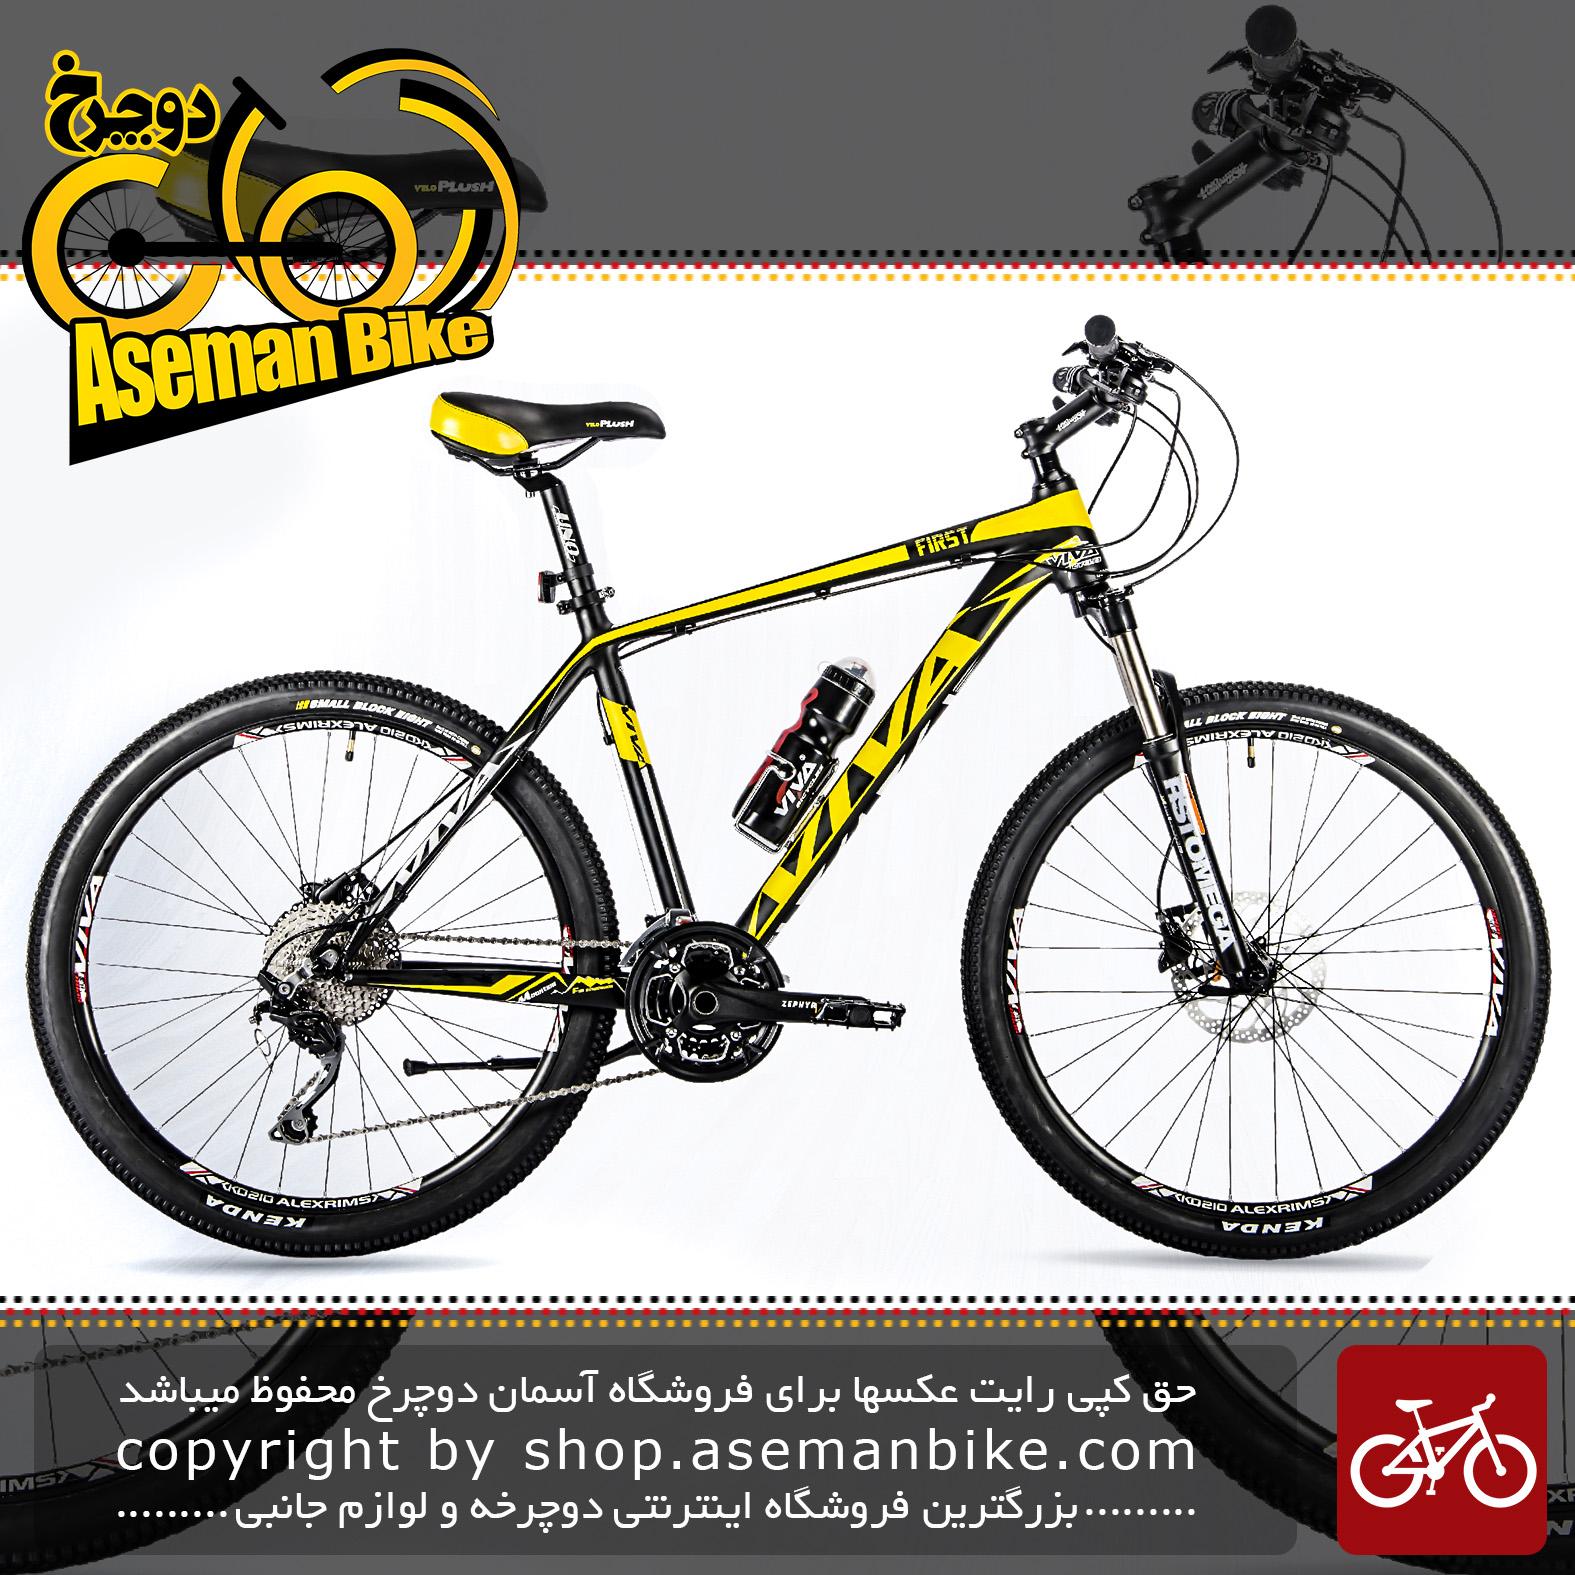 دوچرخه کوهستان شهری ویوا مدل فرست ترمز دیسکی روغنی هیدرولیک 30 دنده شیمانو ژاپن سایز 26 Viva Mountain City Bicycle First 19 DISC 26 2018